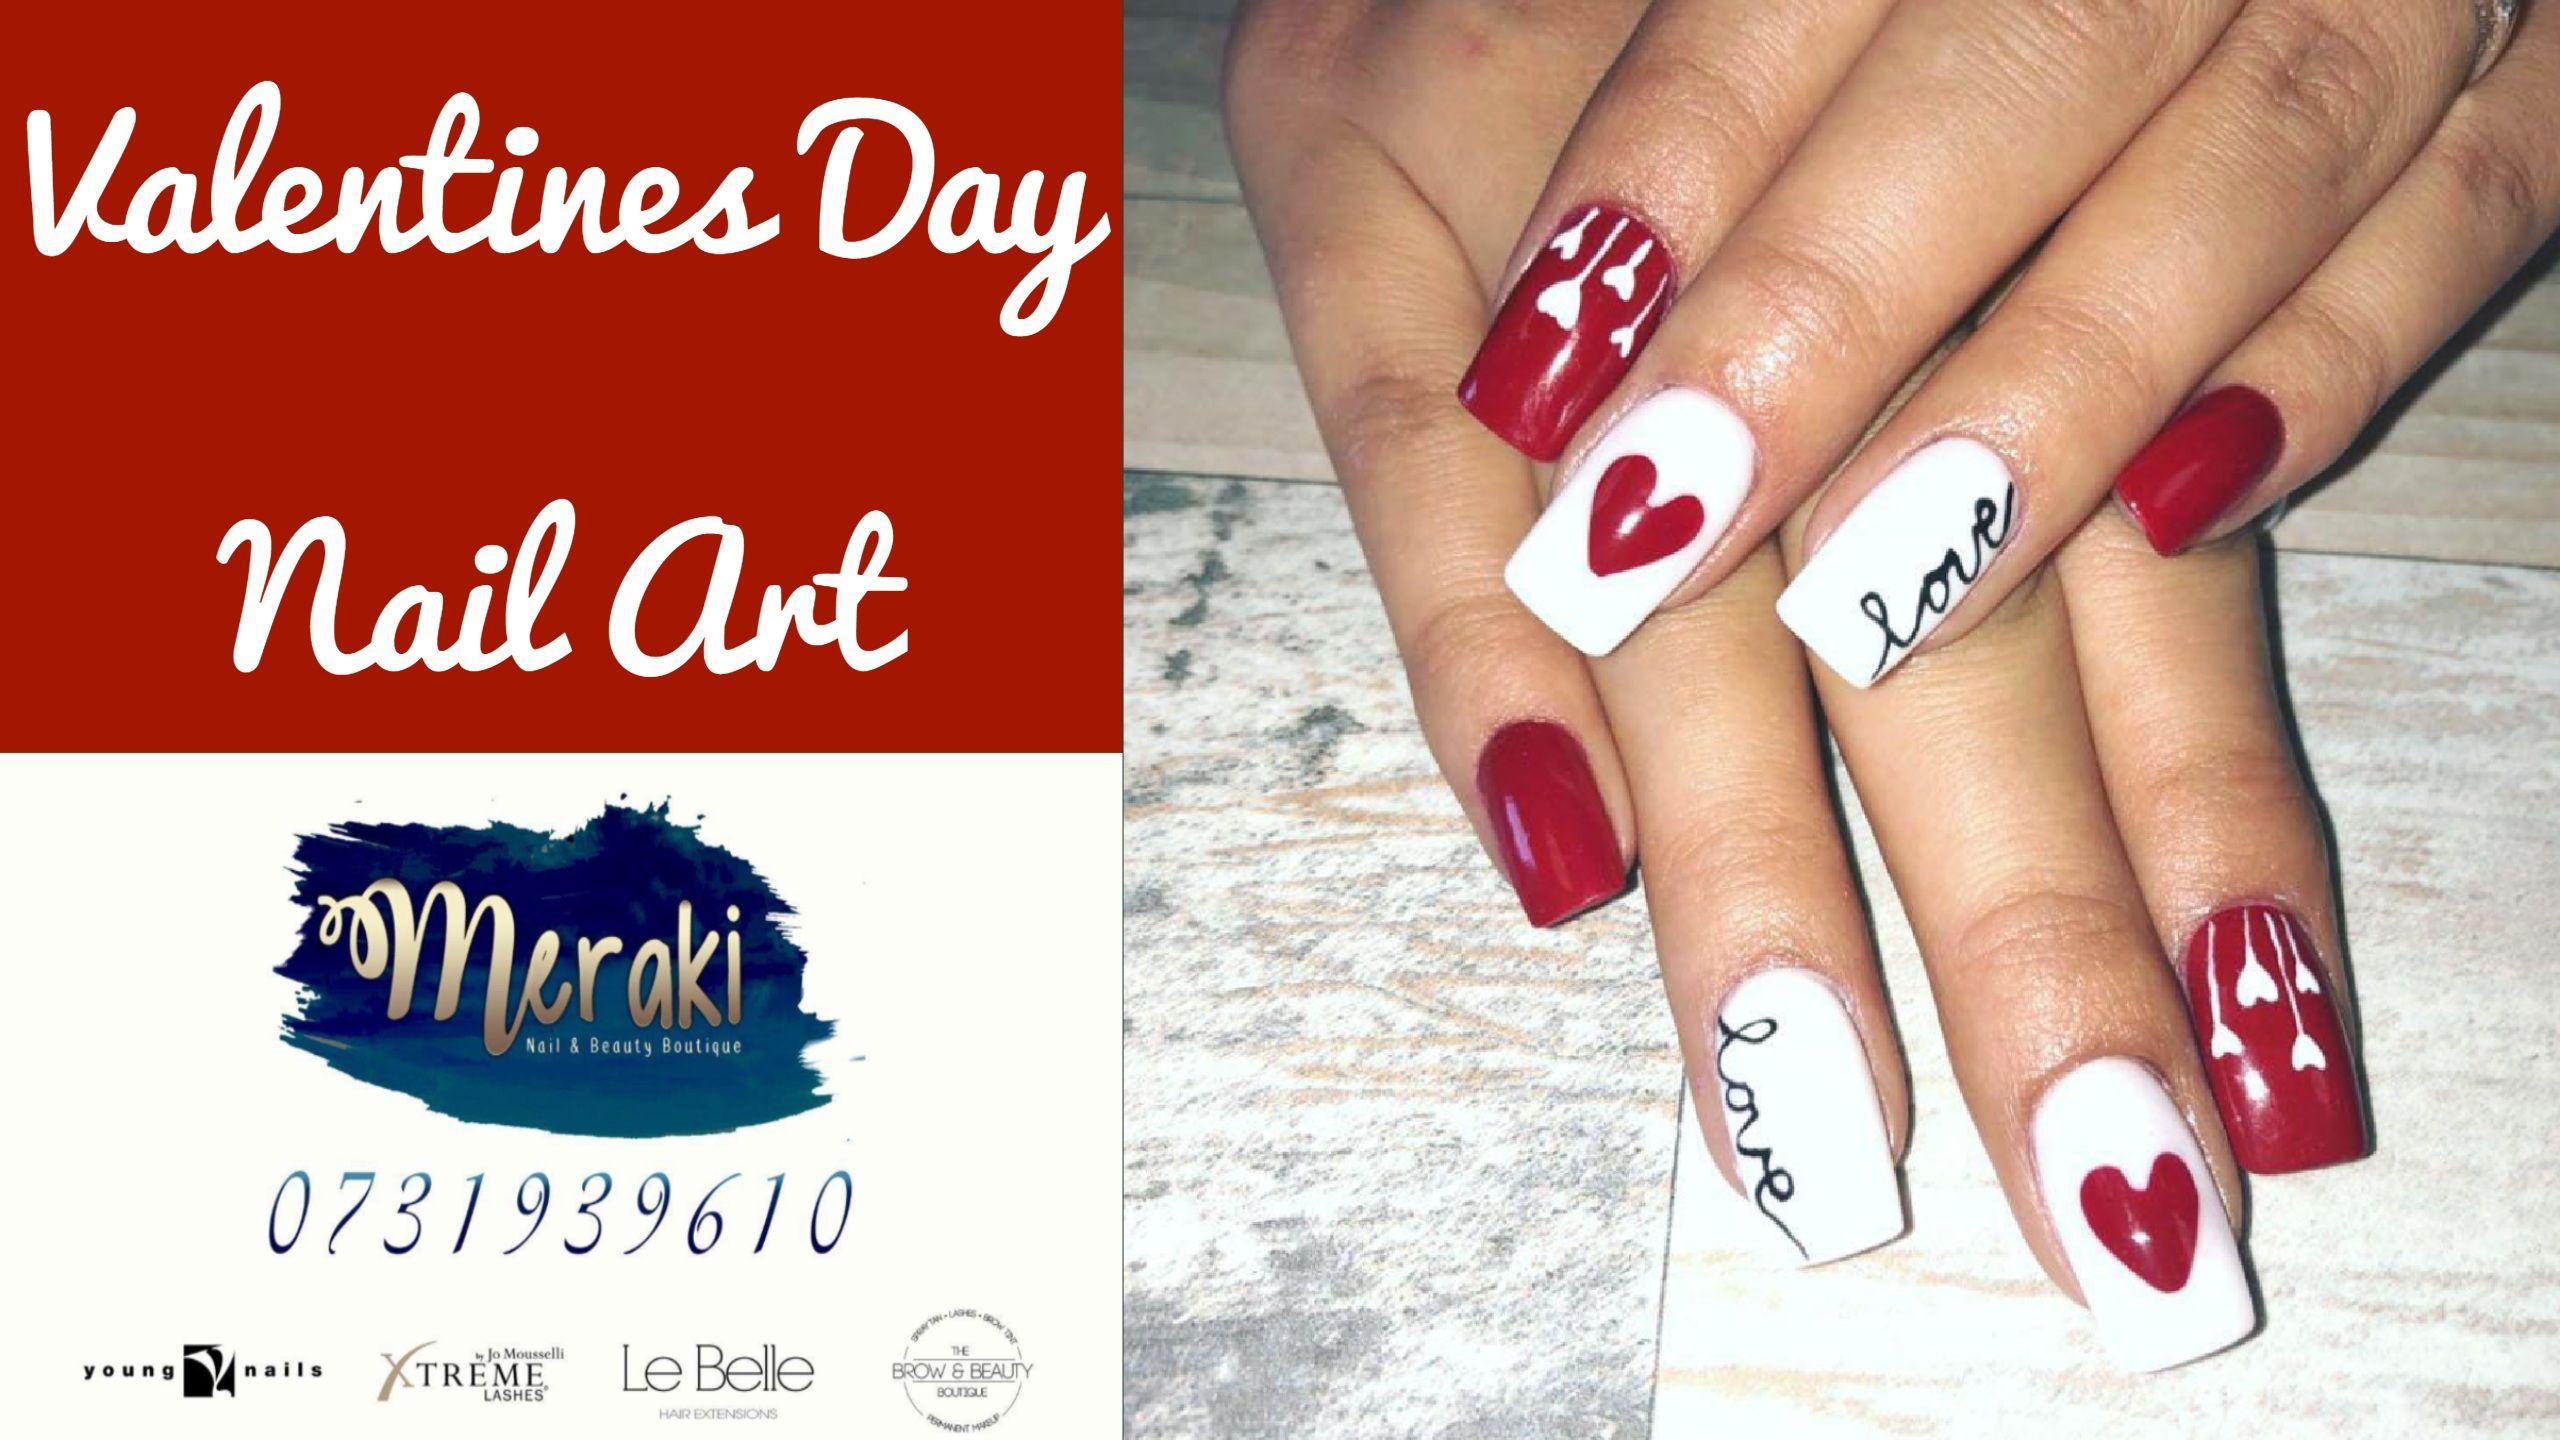 My February (Love) Nail Art Tutorial done by Claudette at Meraki ...